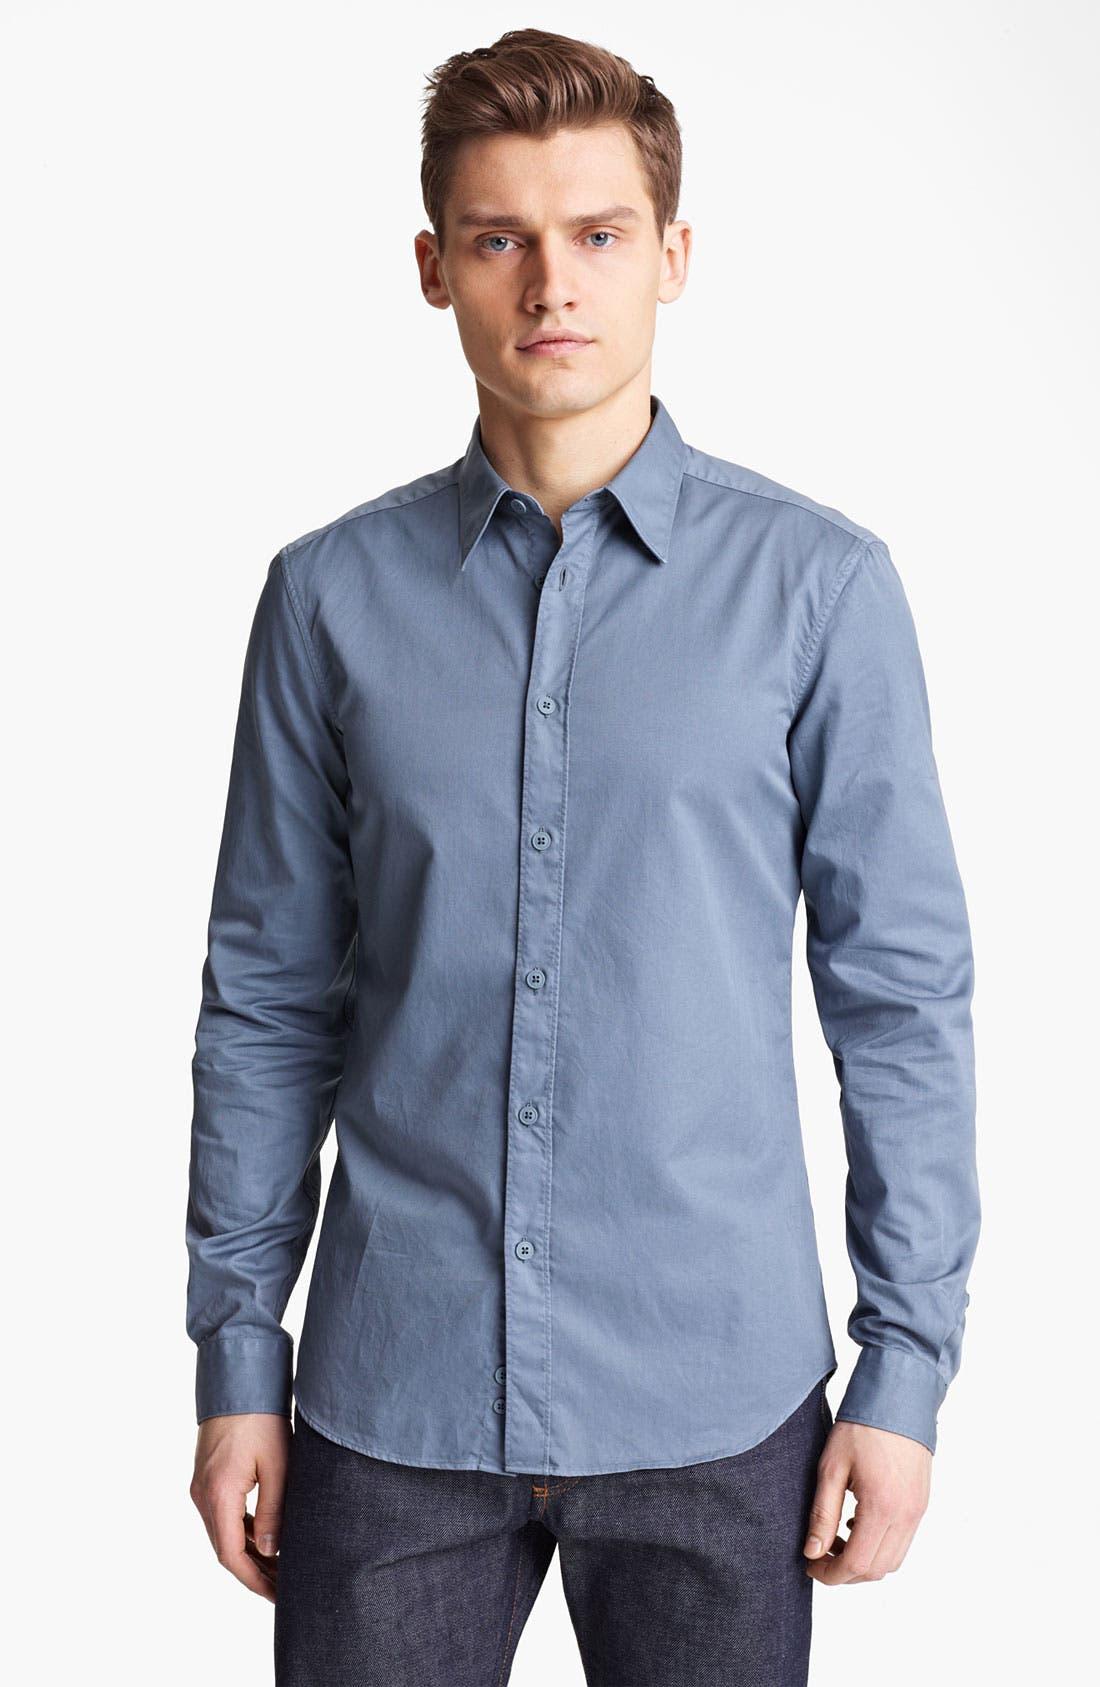 Main Image - Z Zegna Garment Dyed Woven Shirt